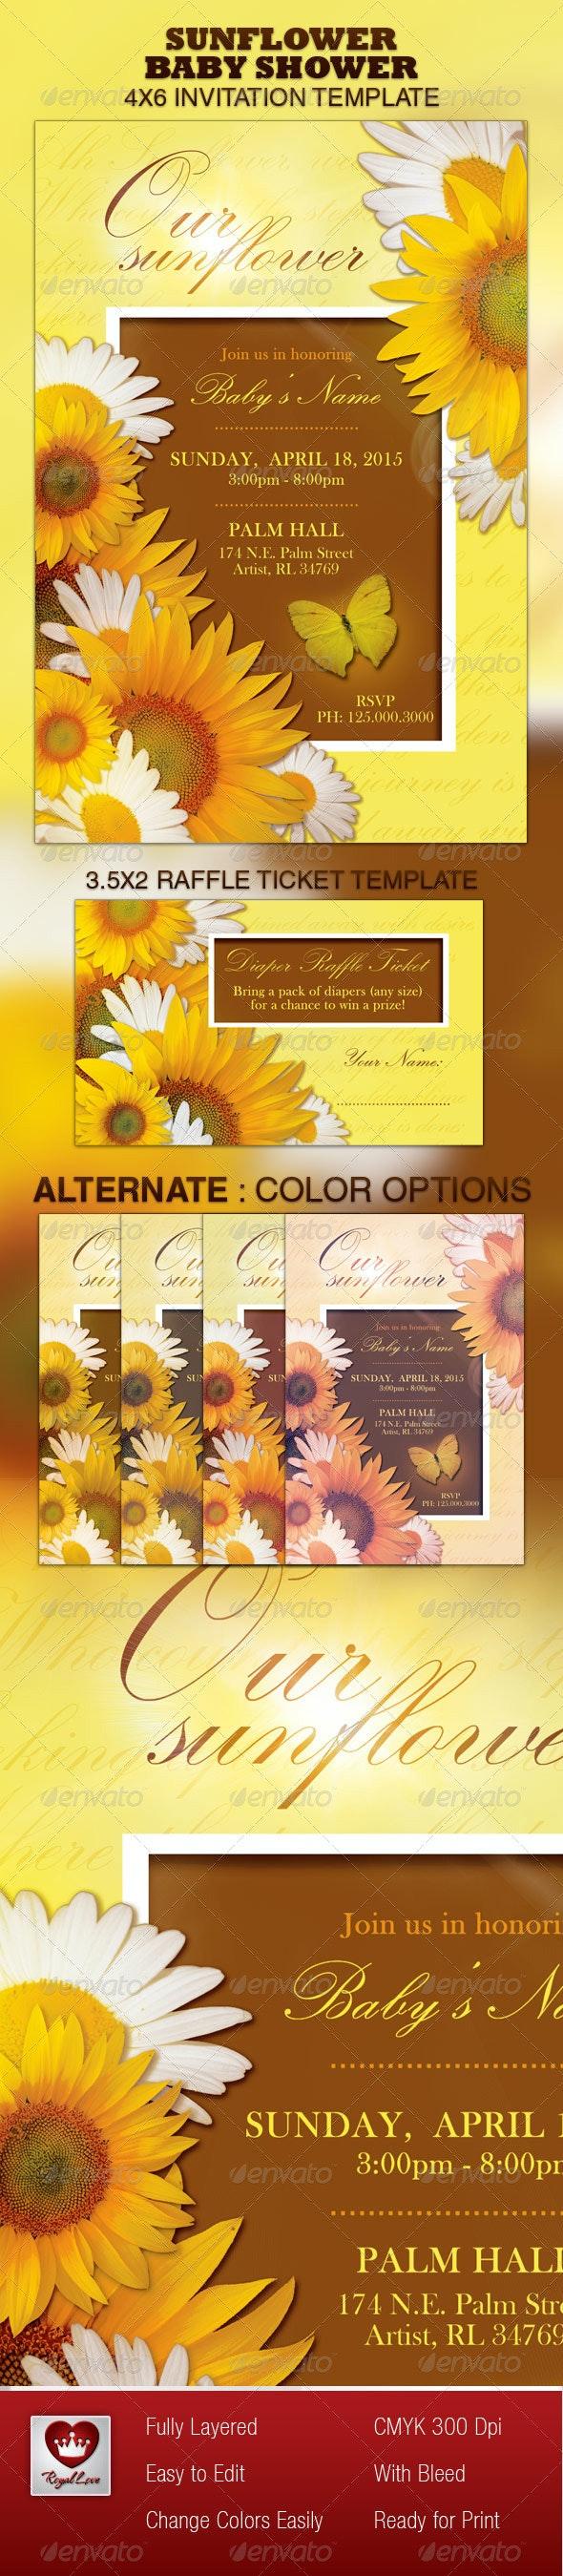 Sunflower Baby Shower Invitation & Raffle Ticket  - Invitations Cards & Invites